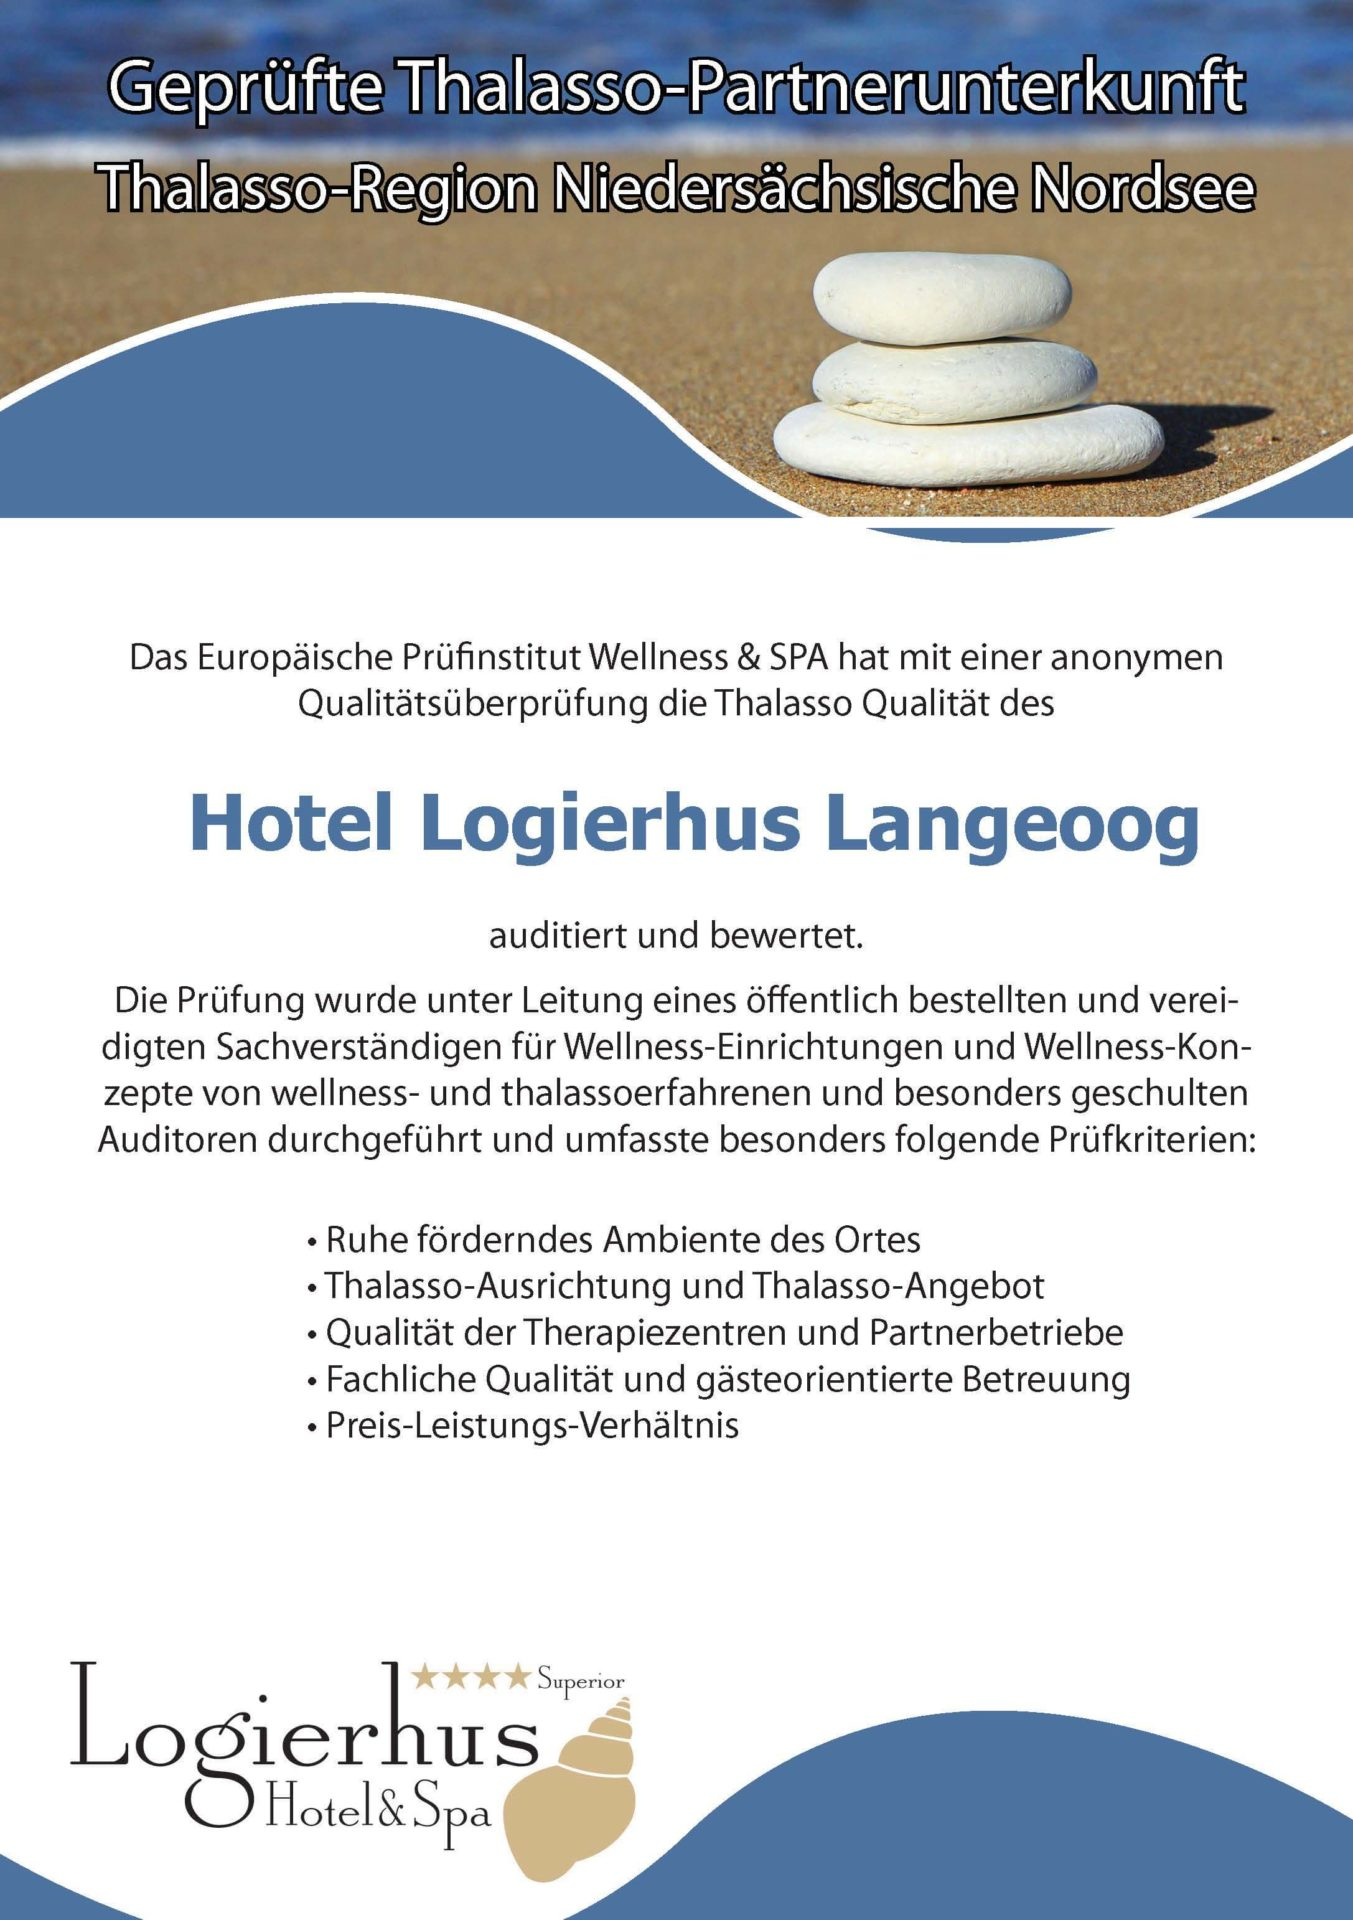 Logierhus Langeoog Hotel Langeoog Thalasso